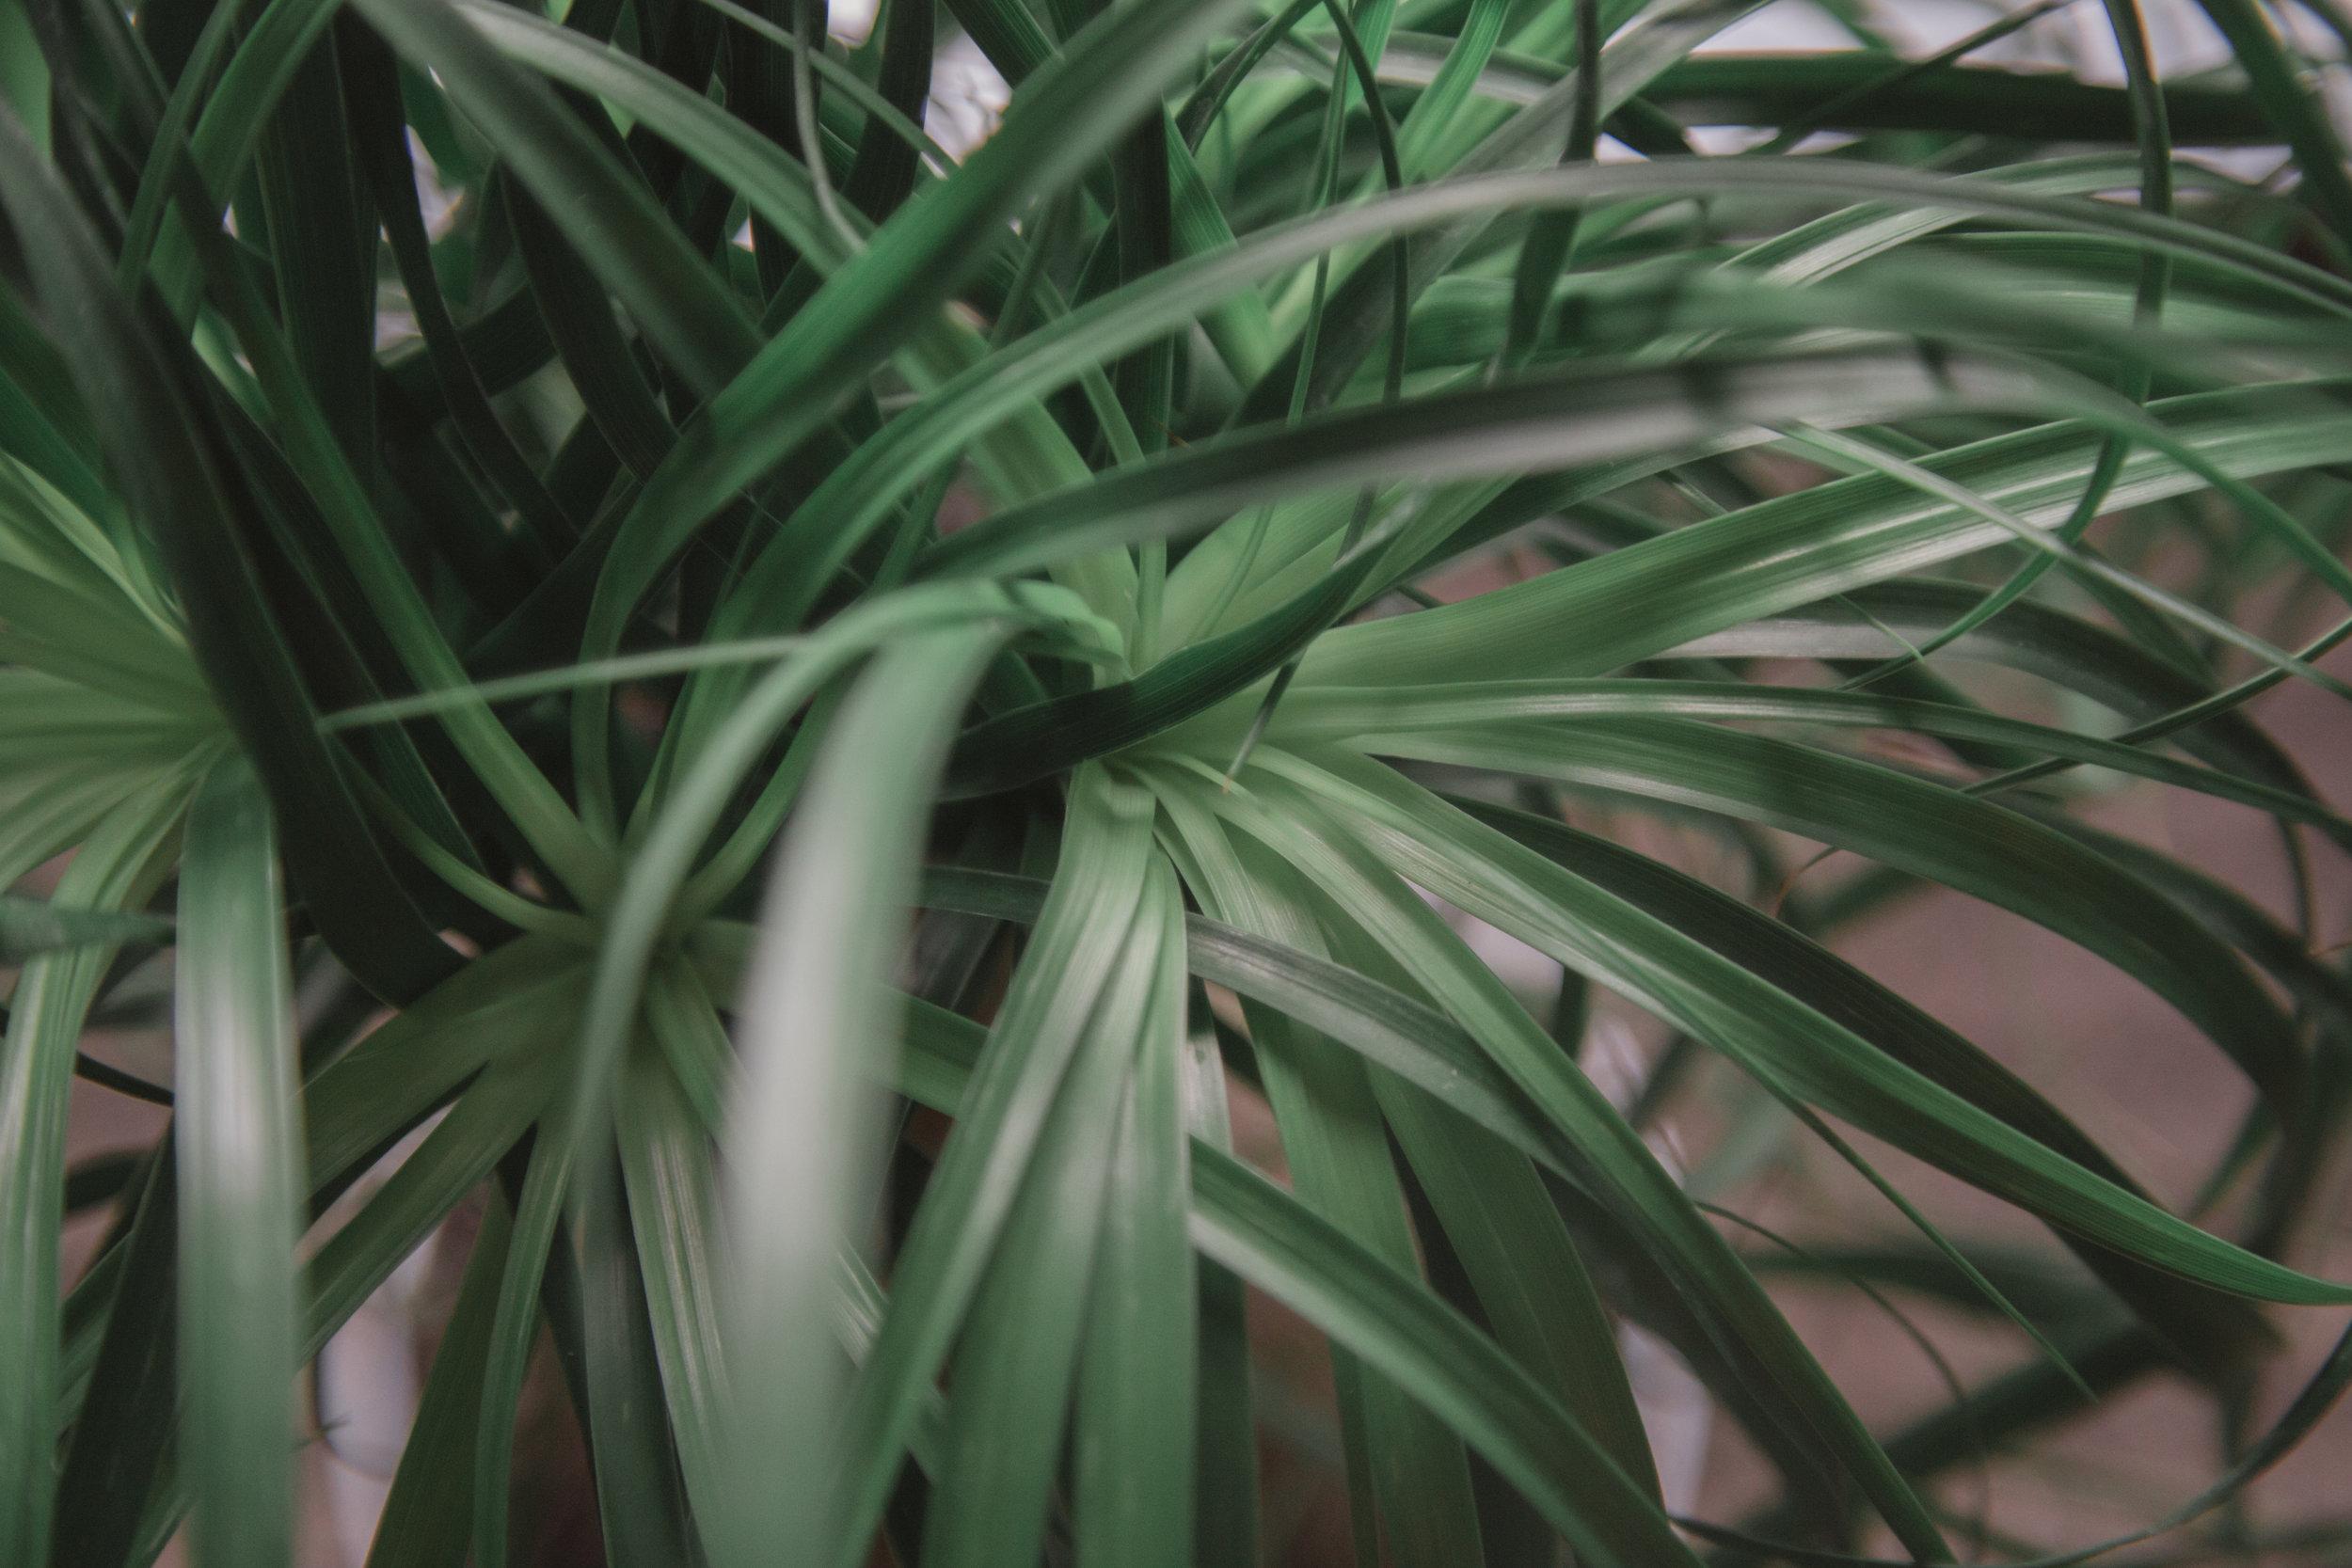 214 // 366 Gorgeous birthday plant from Seth